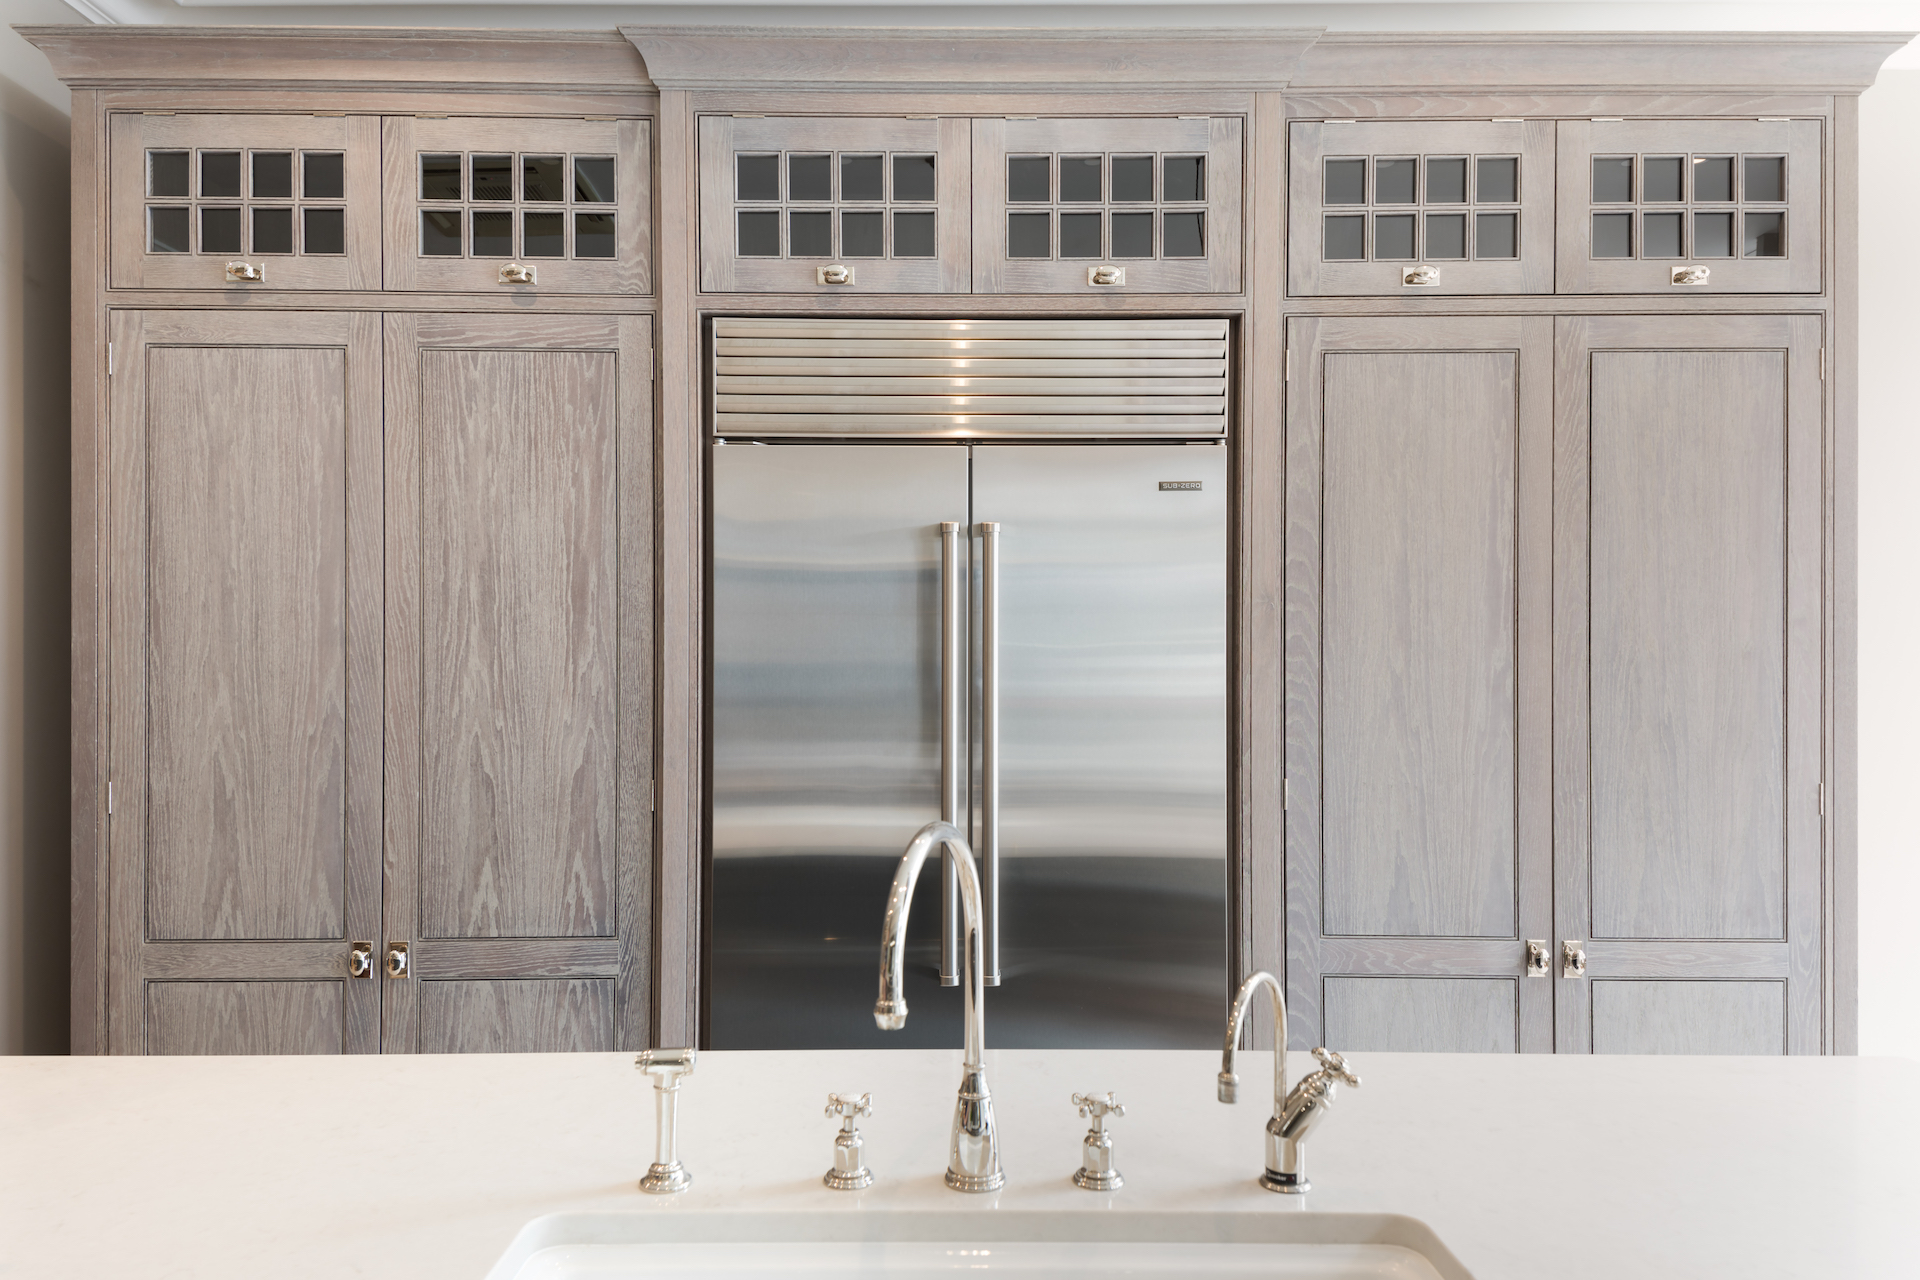 Sub Zero Glass Door Refrigerator sub-zero french door over-and-under refrigerator / freezer